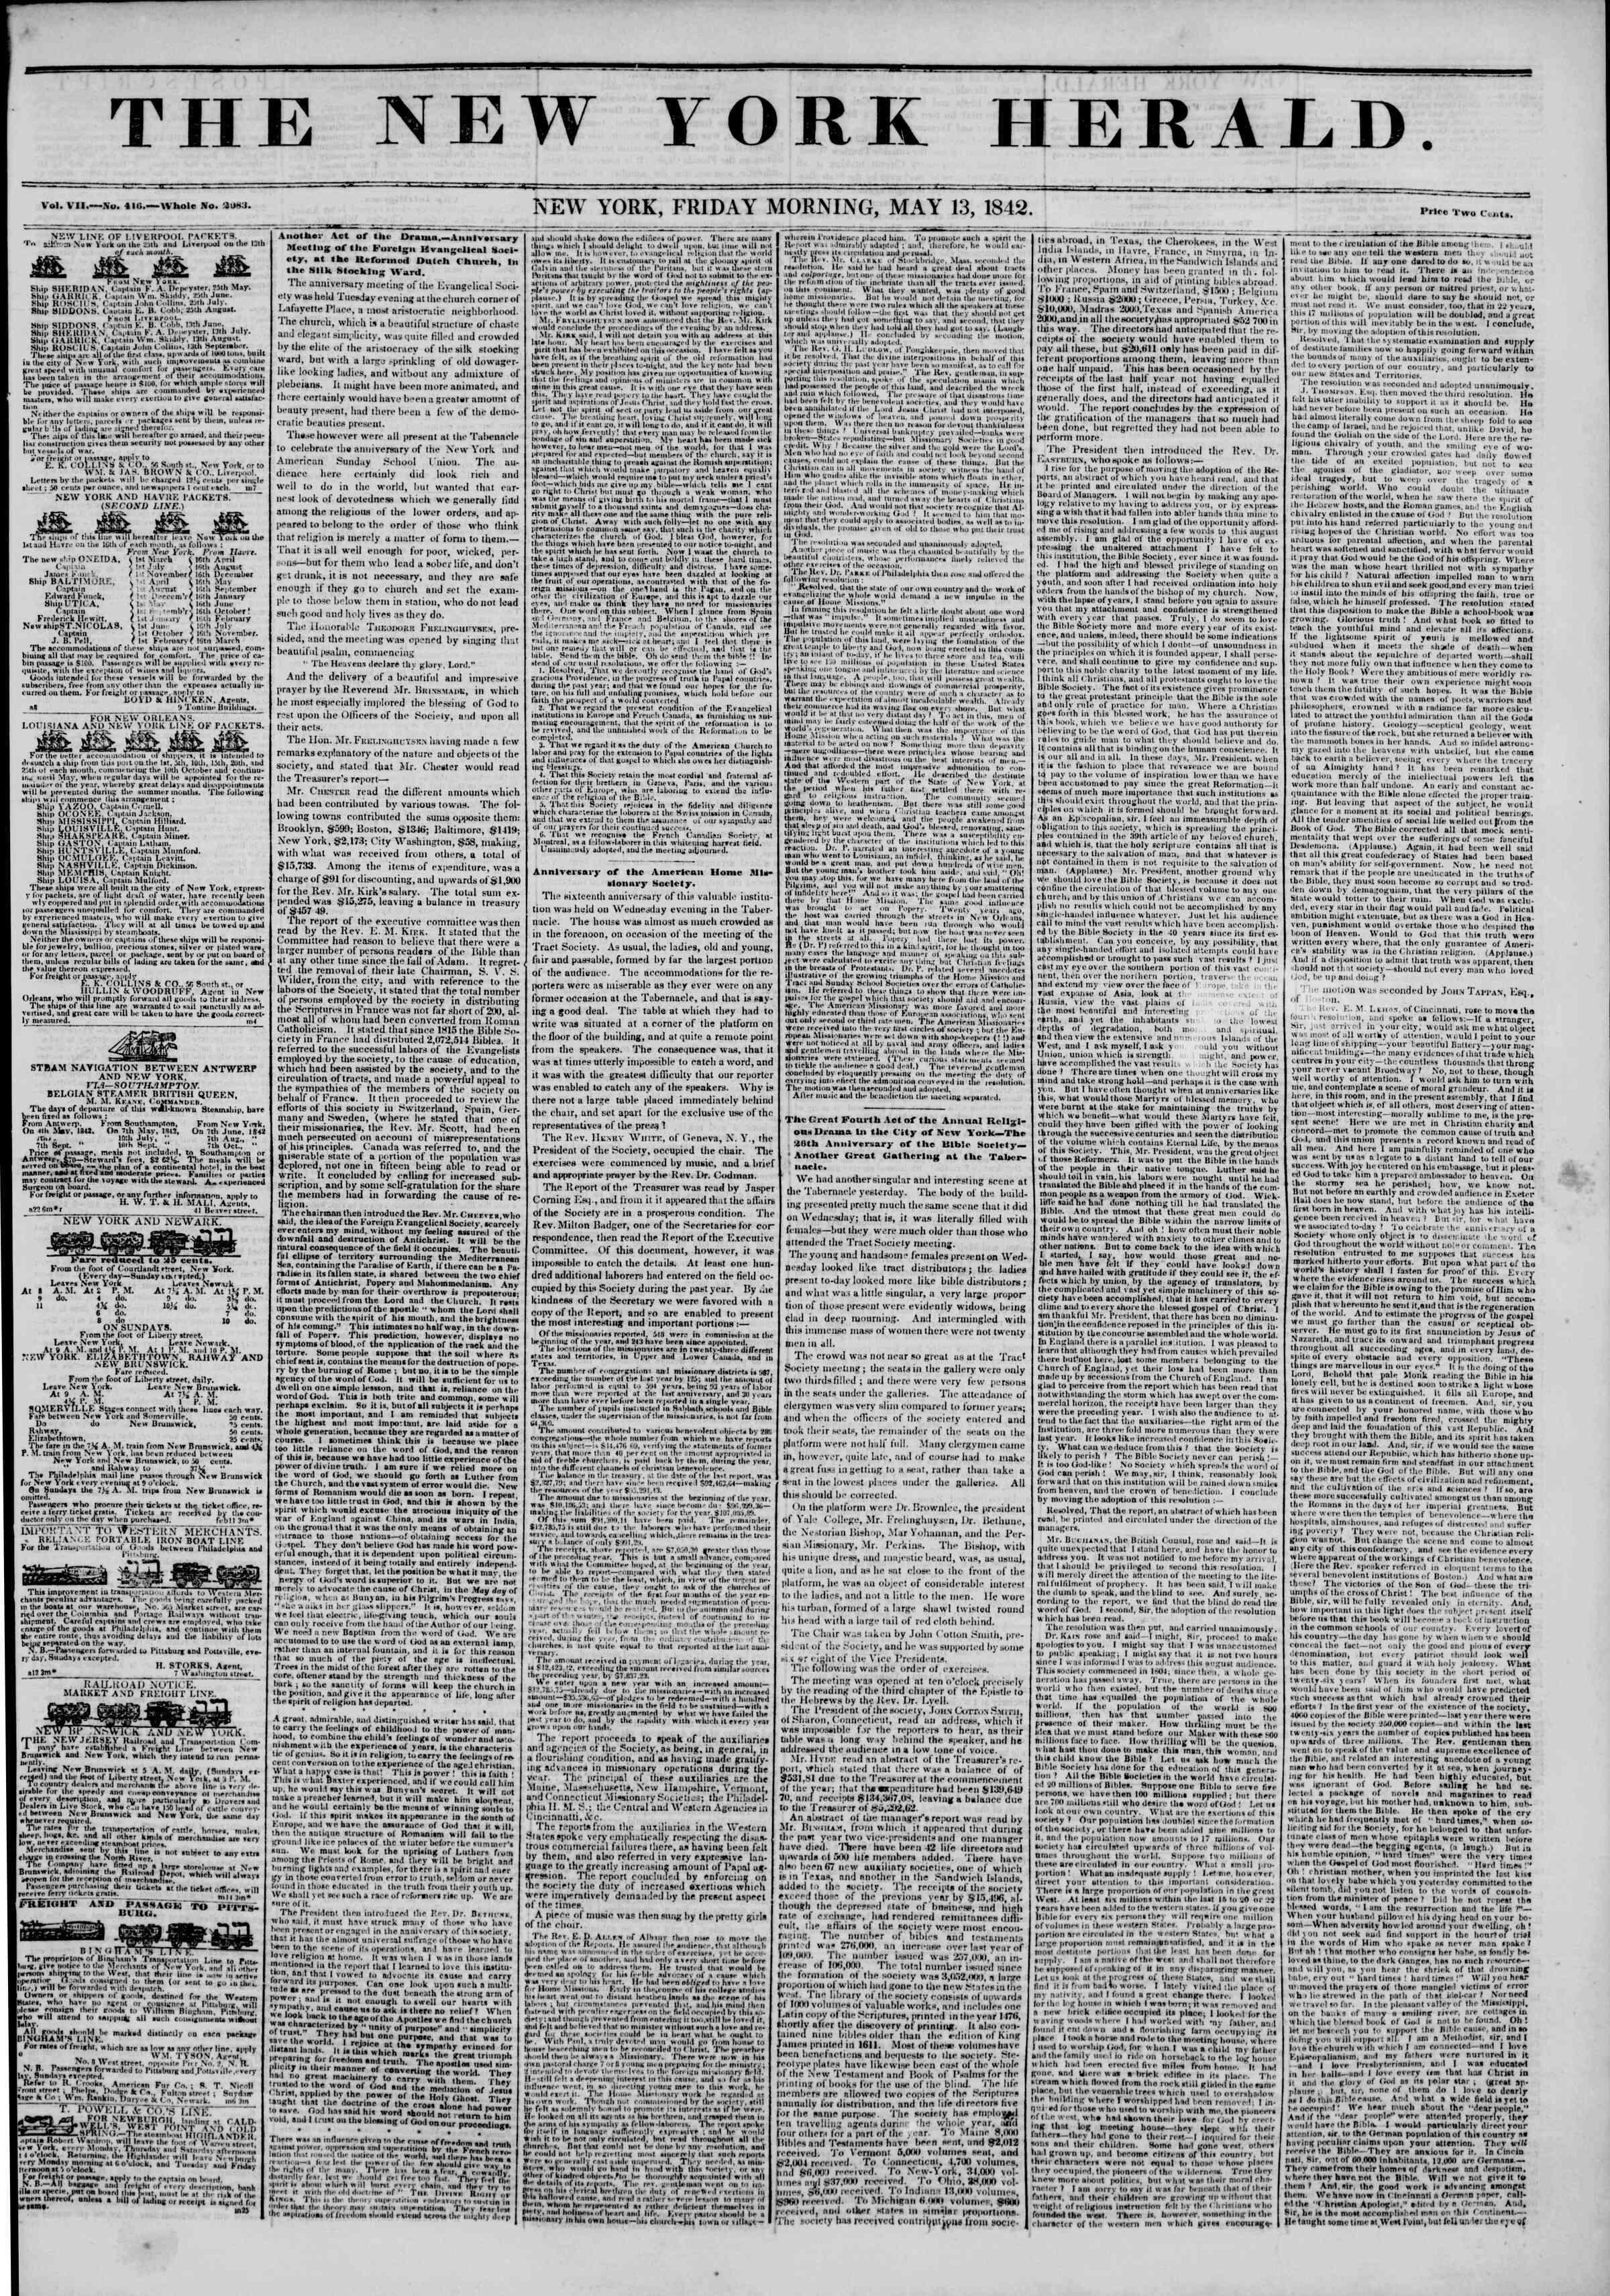 May 13, 1842 Tarihli The New York Herald Gazetesi Sayfa 1